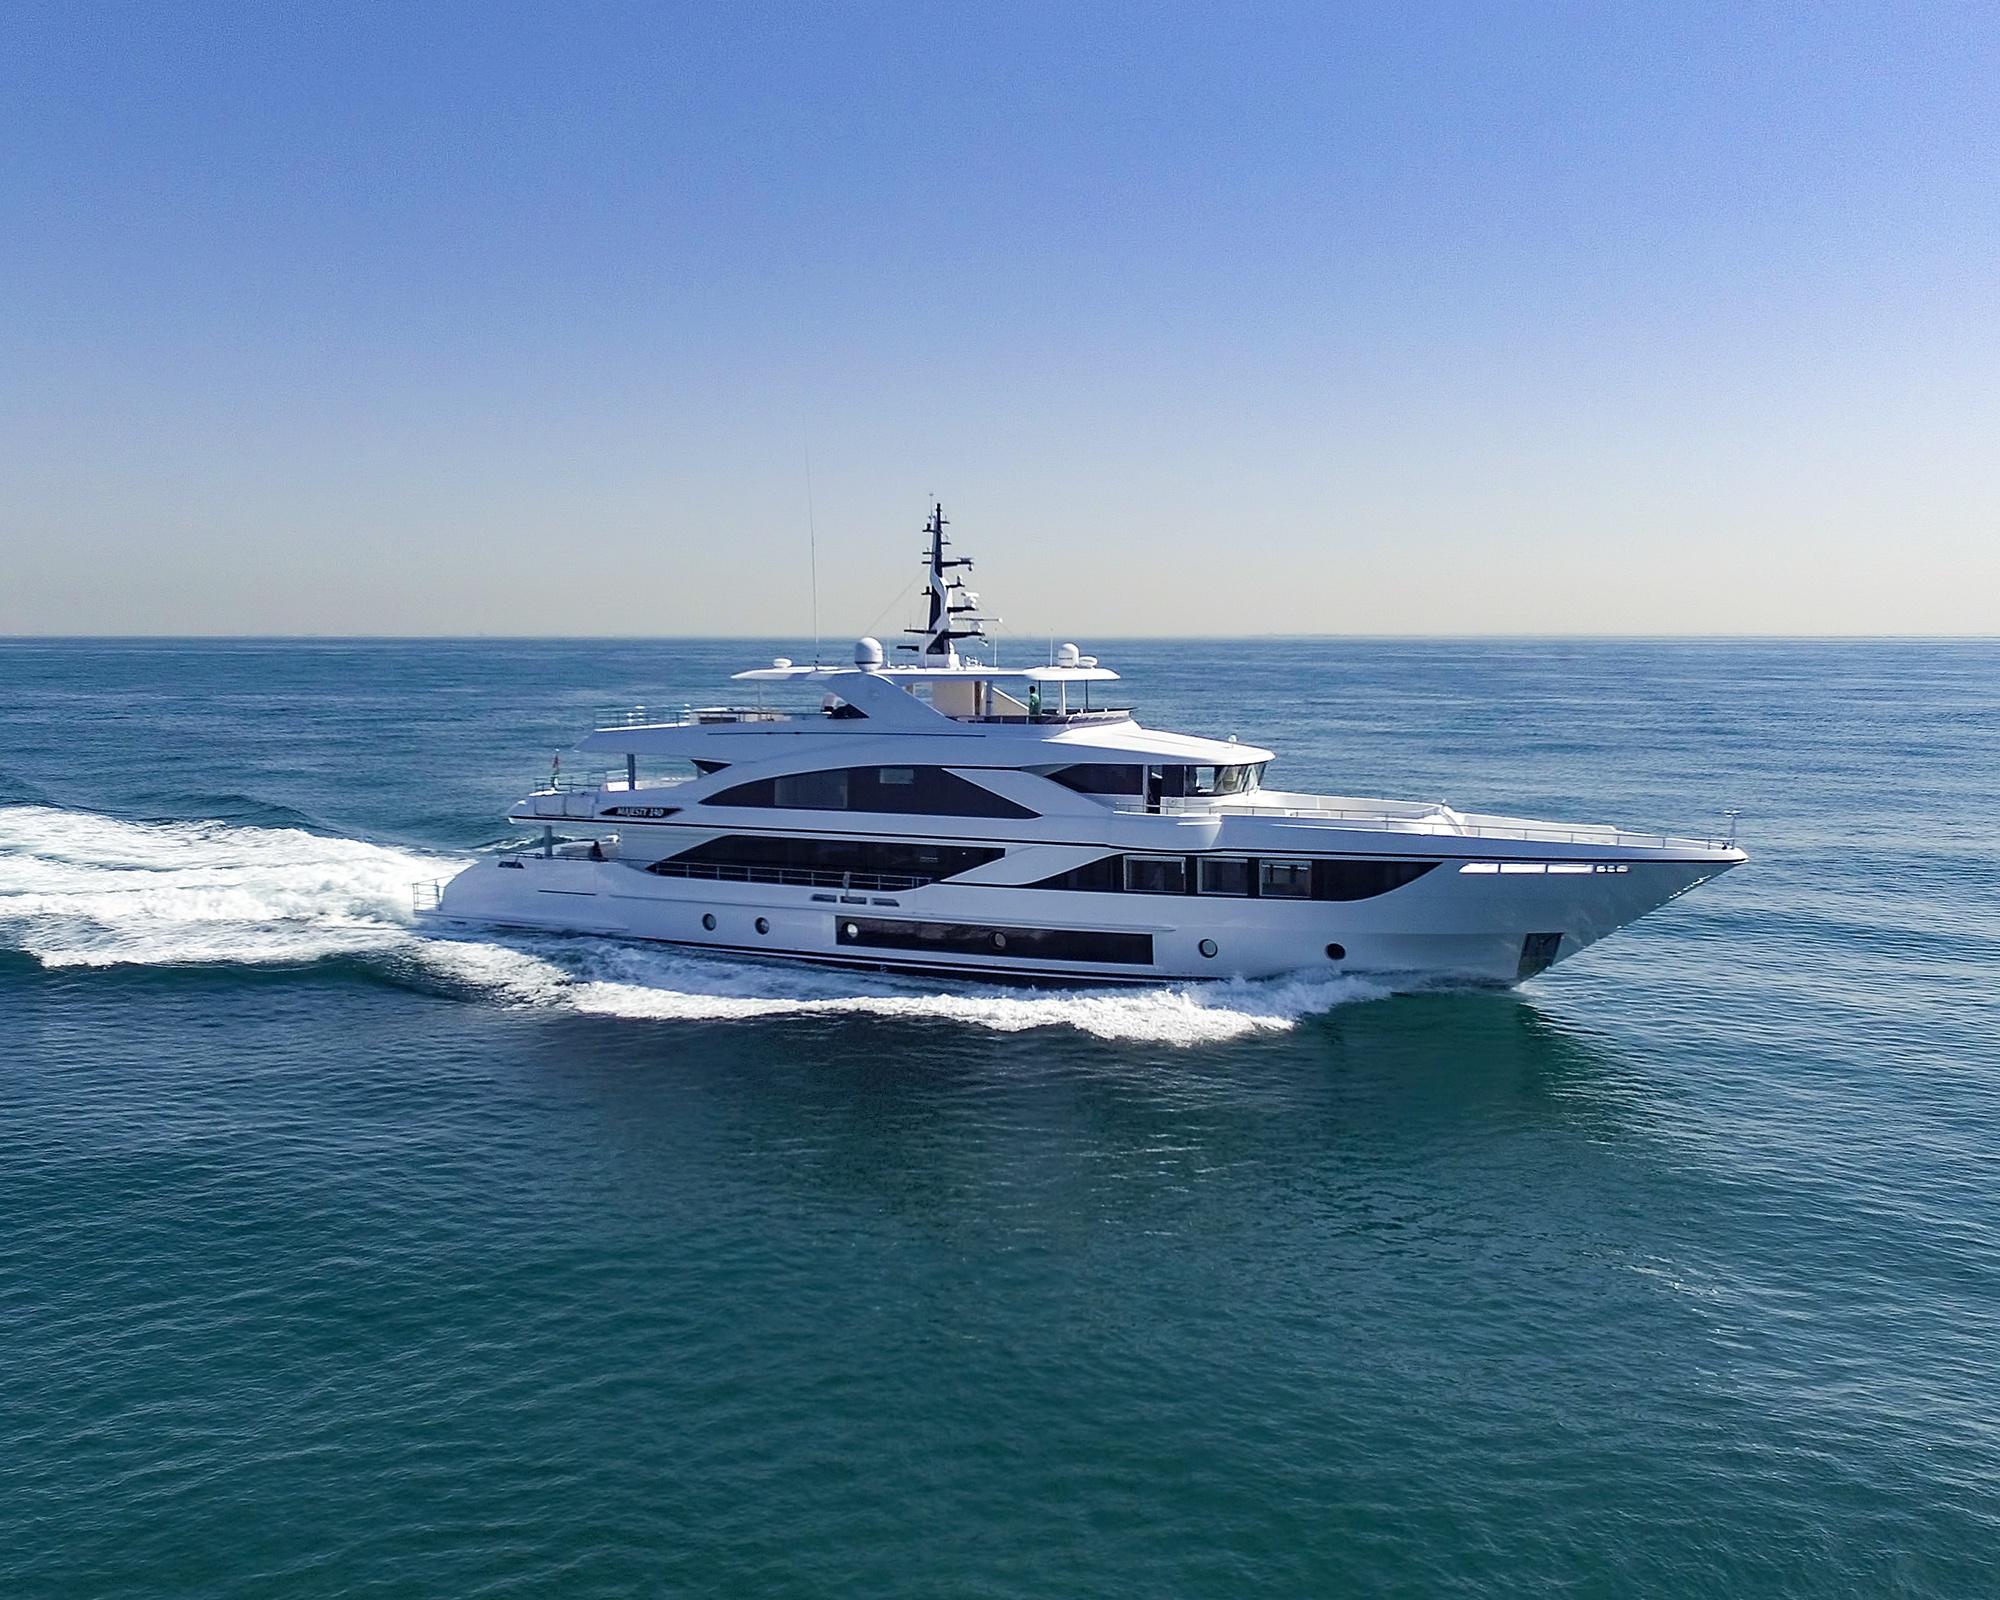 Gulf Craft's newly unveiled Majesty 140 superyacht